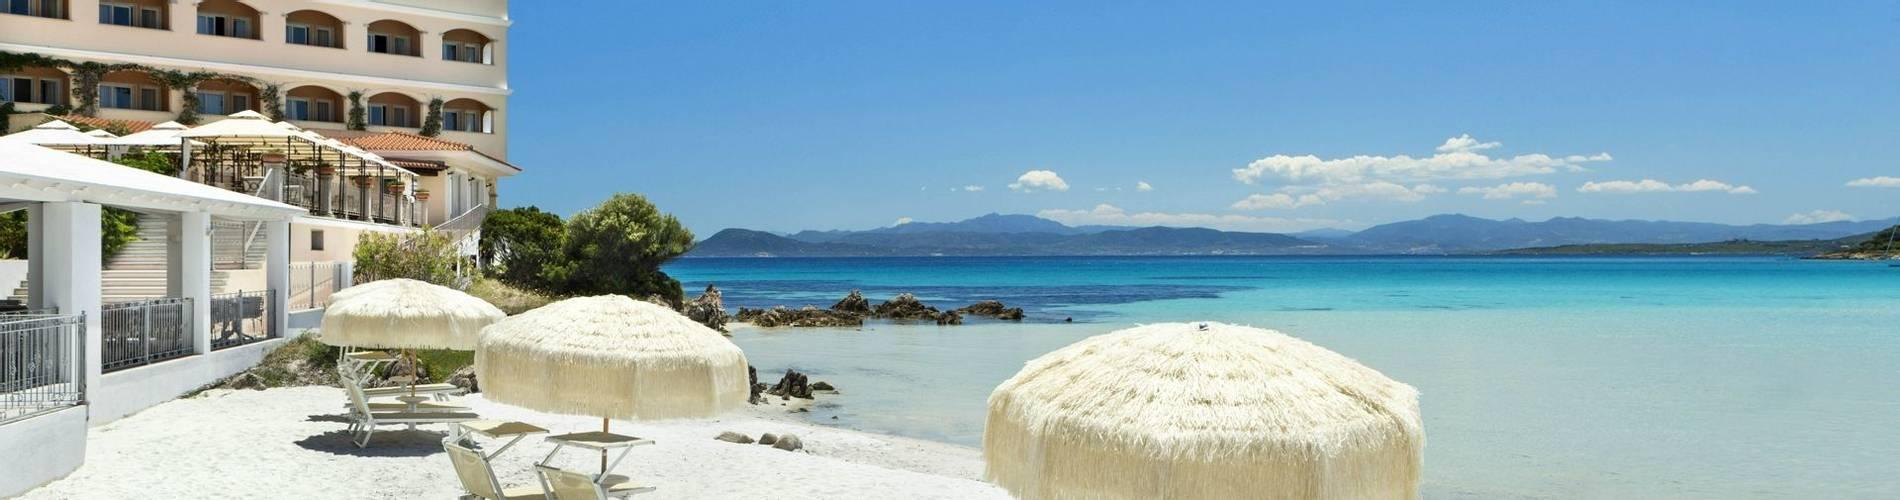 1 Private Beach - Gabbiano Azzurro Sardegna.jpg